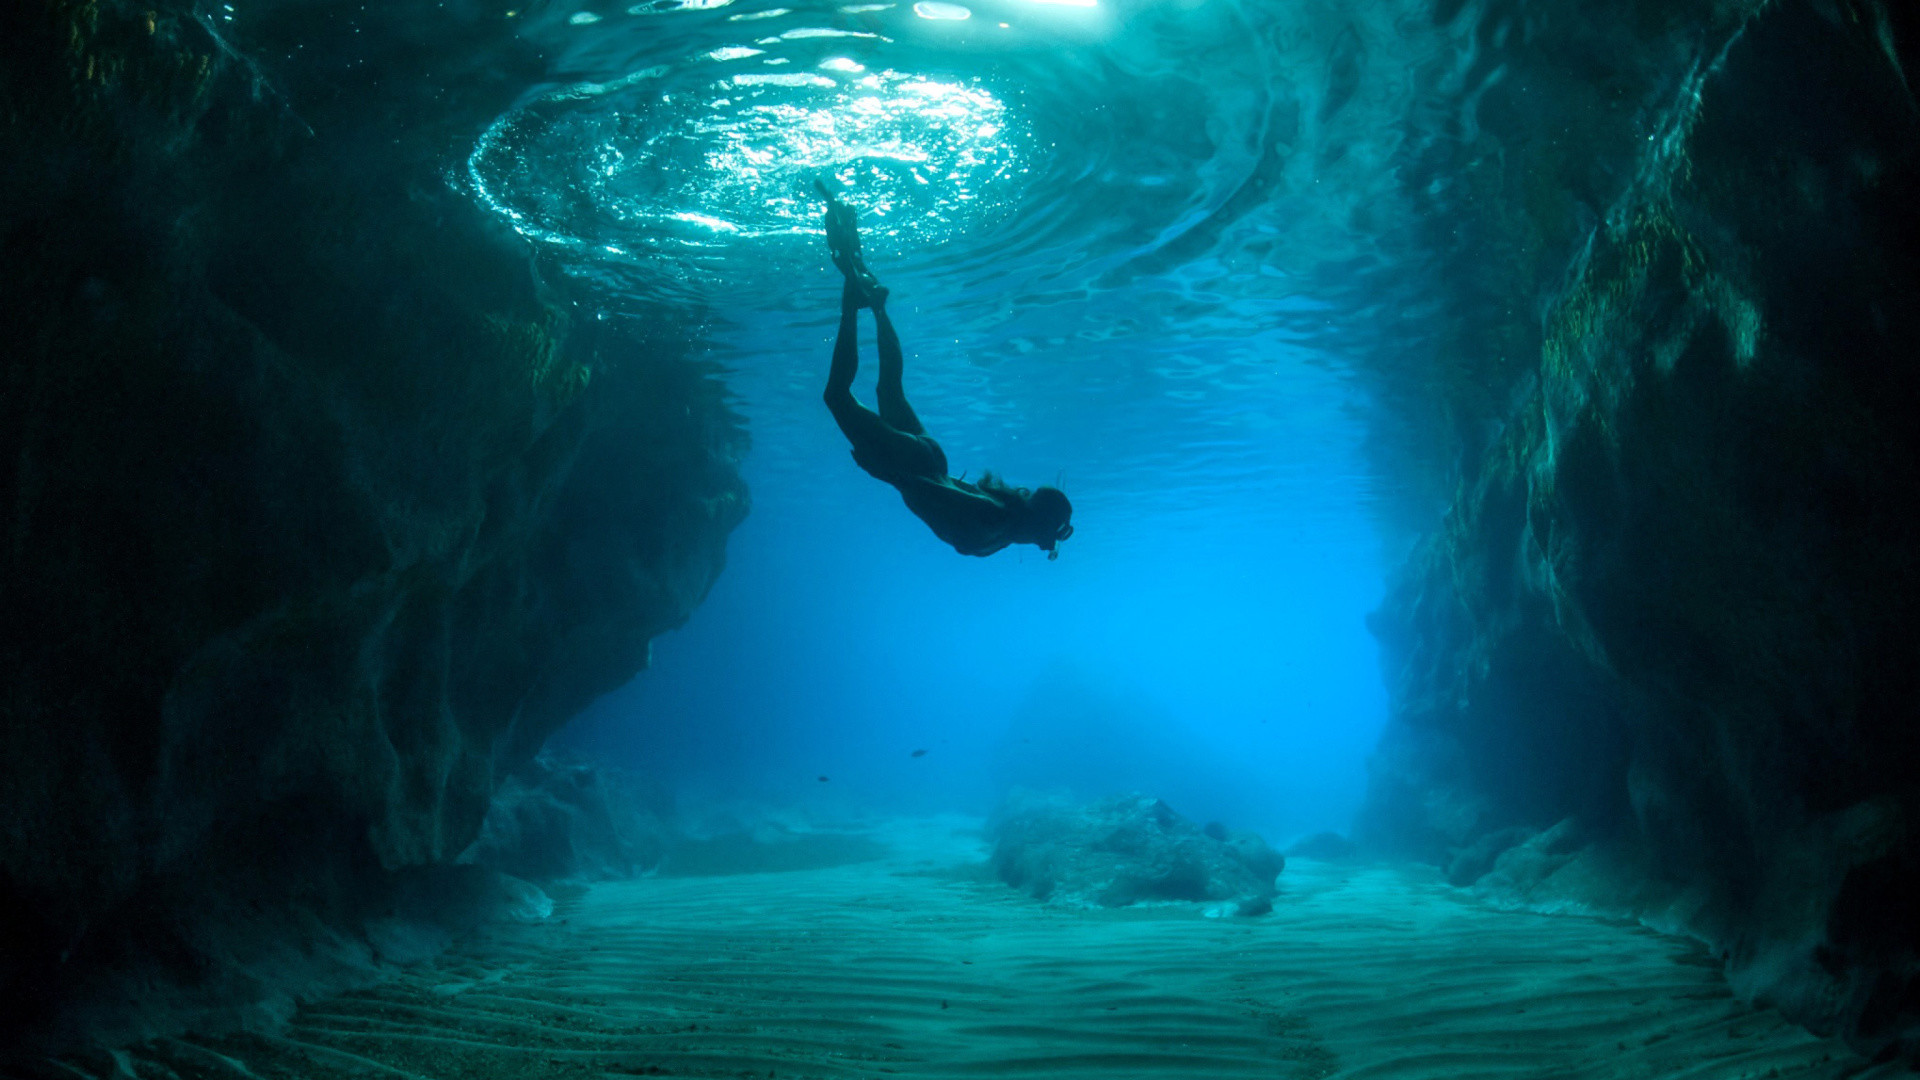 Freediving Wallpaper (62+ Images